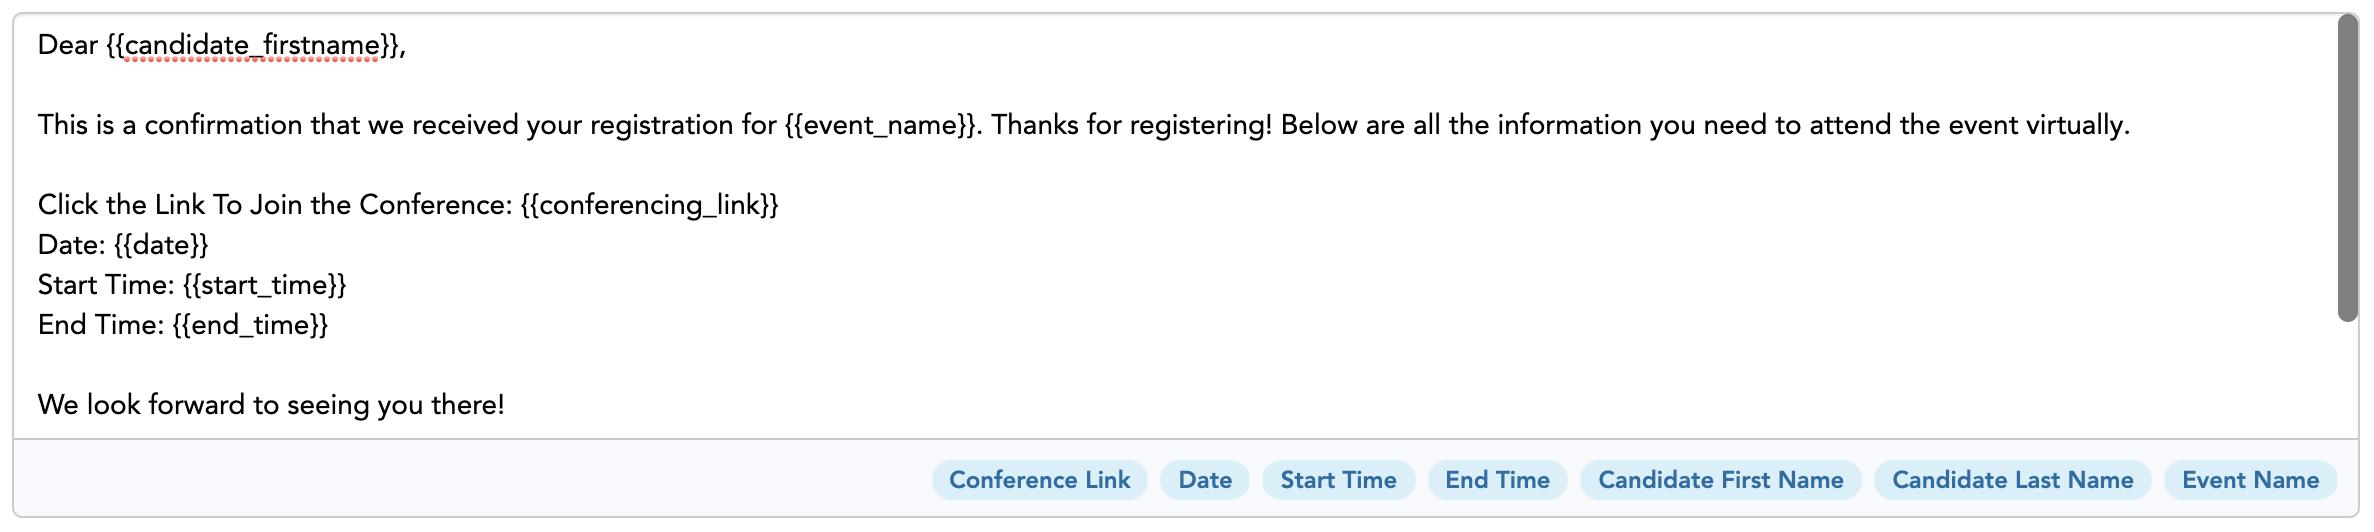 Flo Recruit default virtual event confirmation email emplate